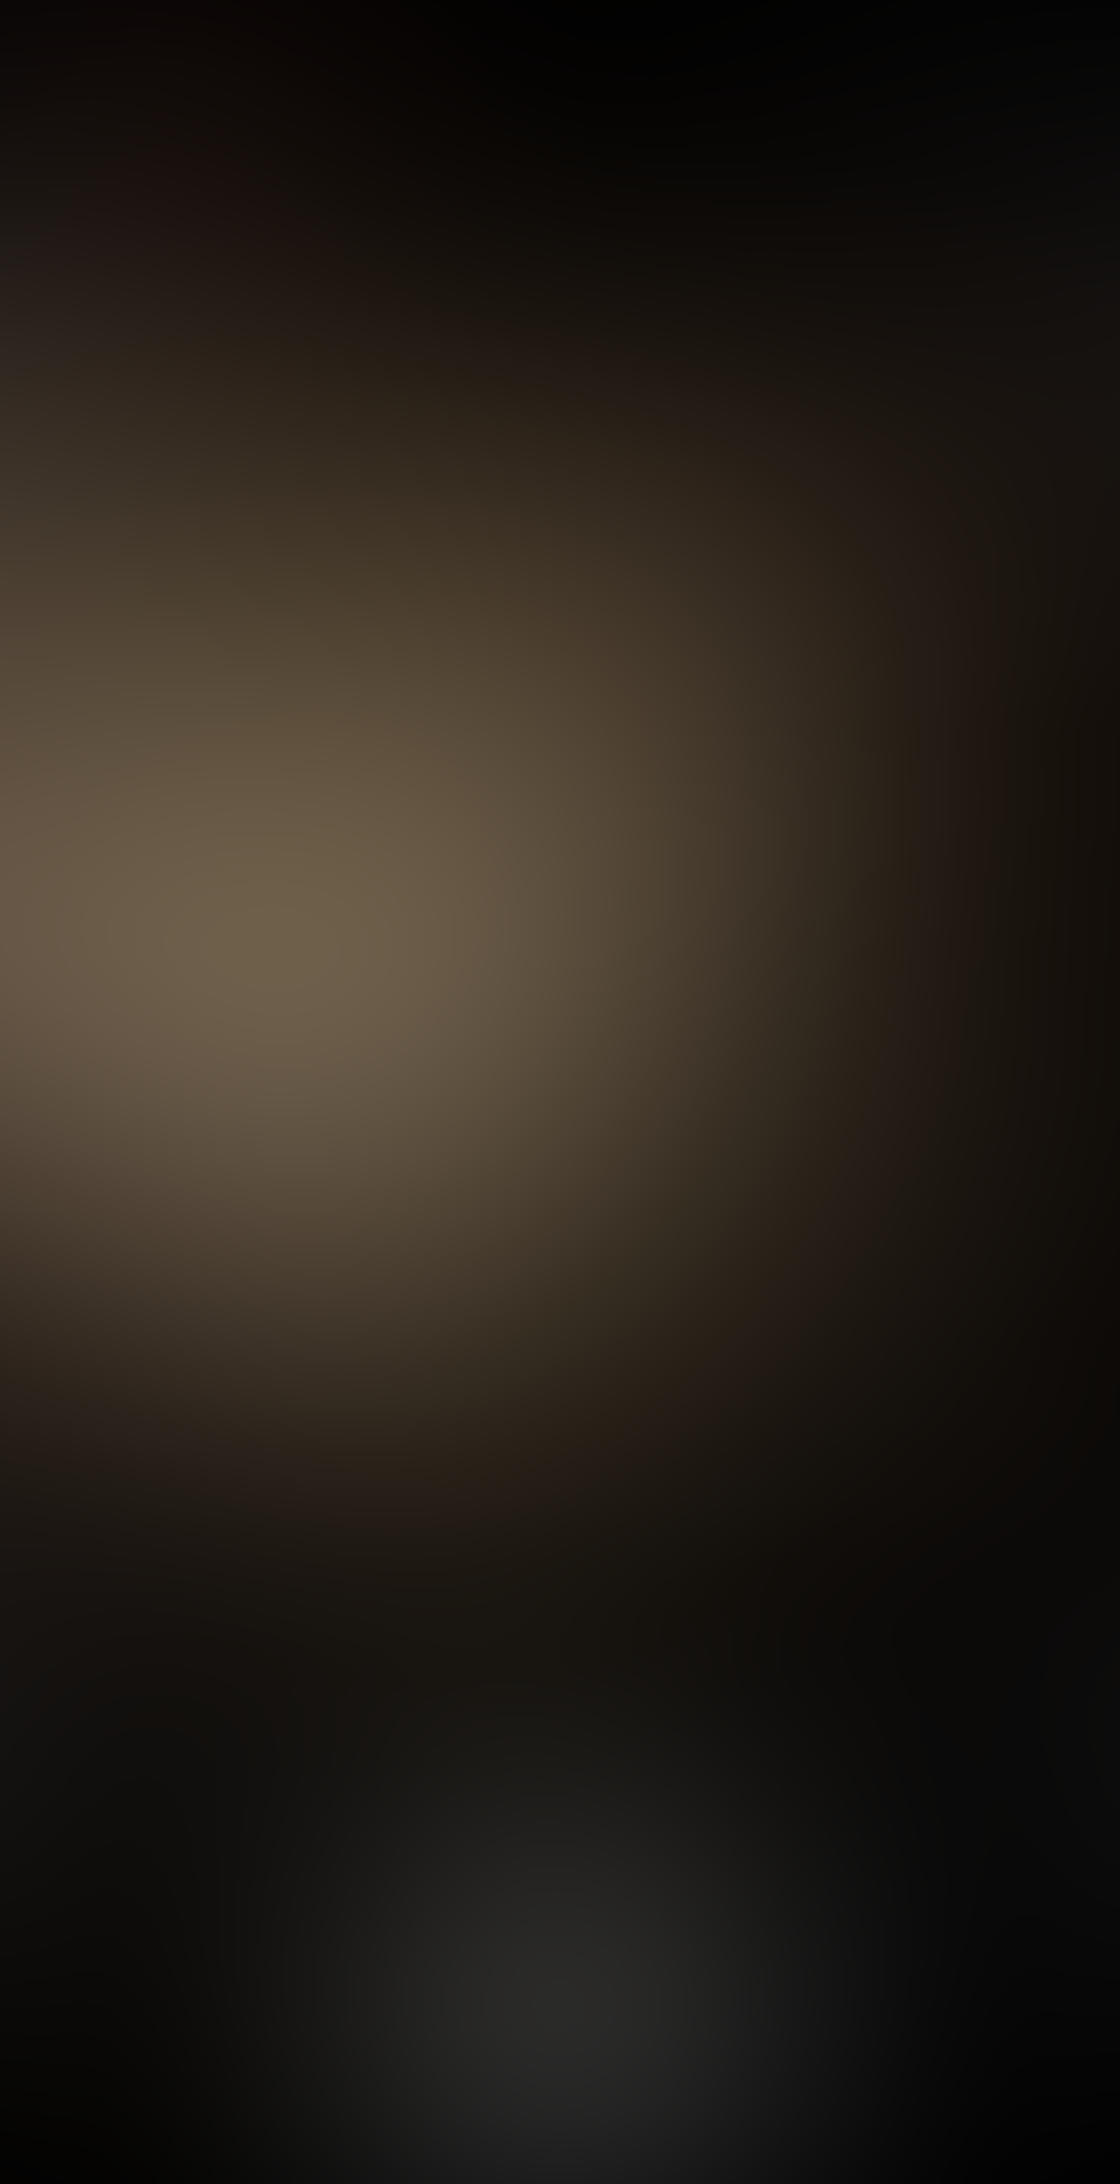 iphone night mode camera